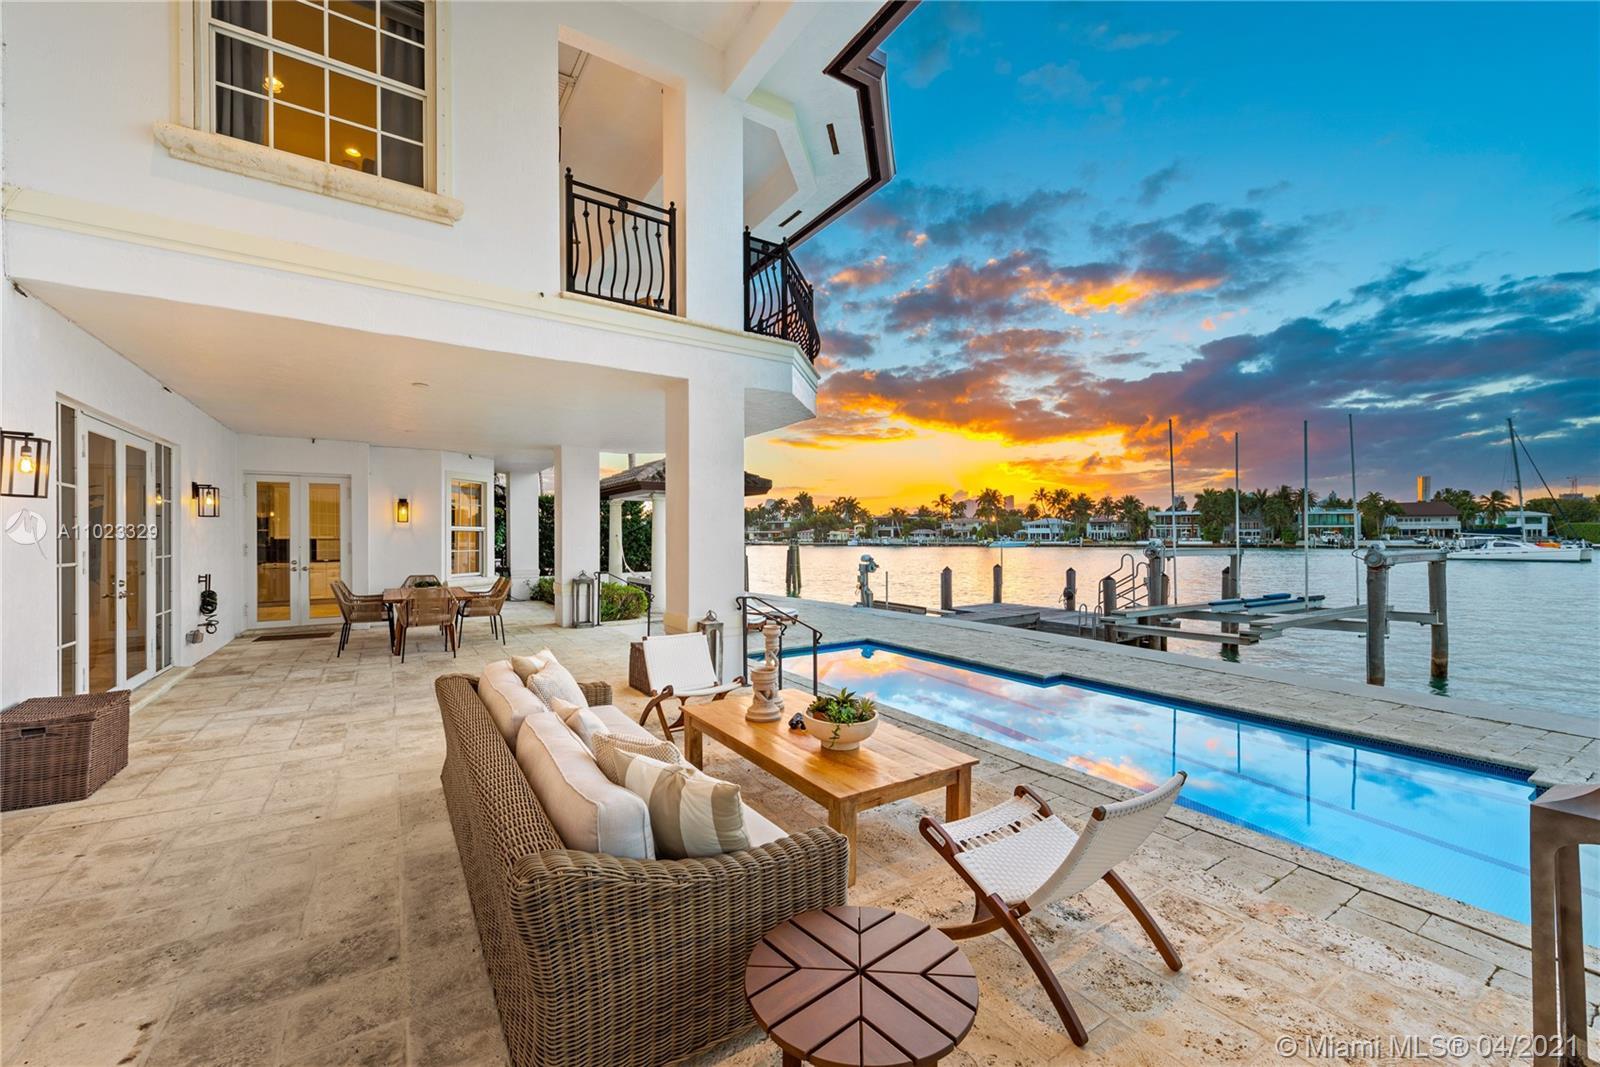 Main property image for  424 W Rivo Alto Dr #